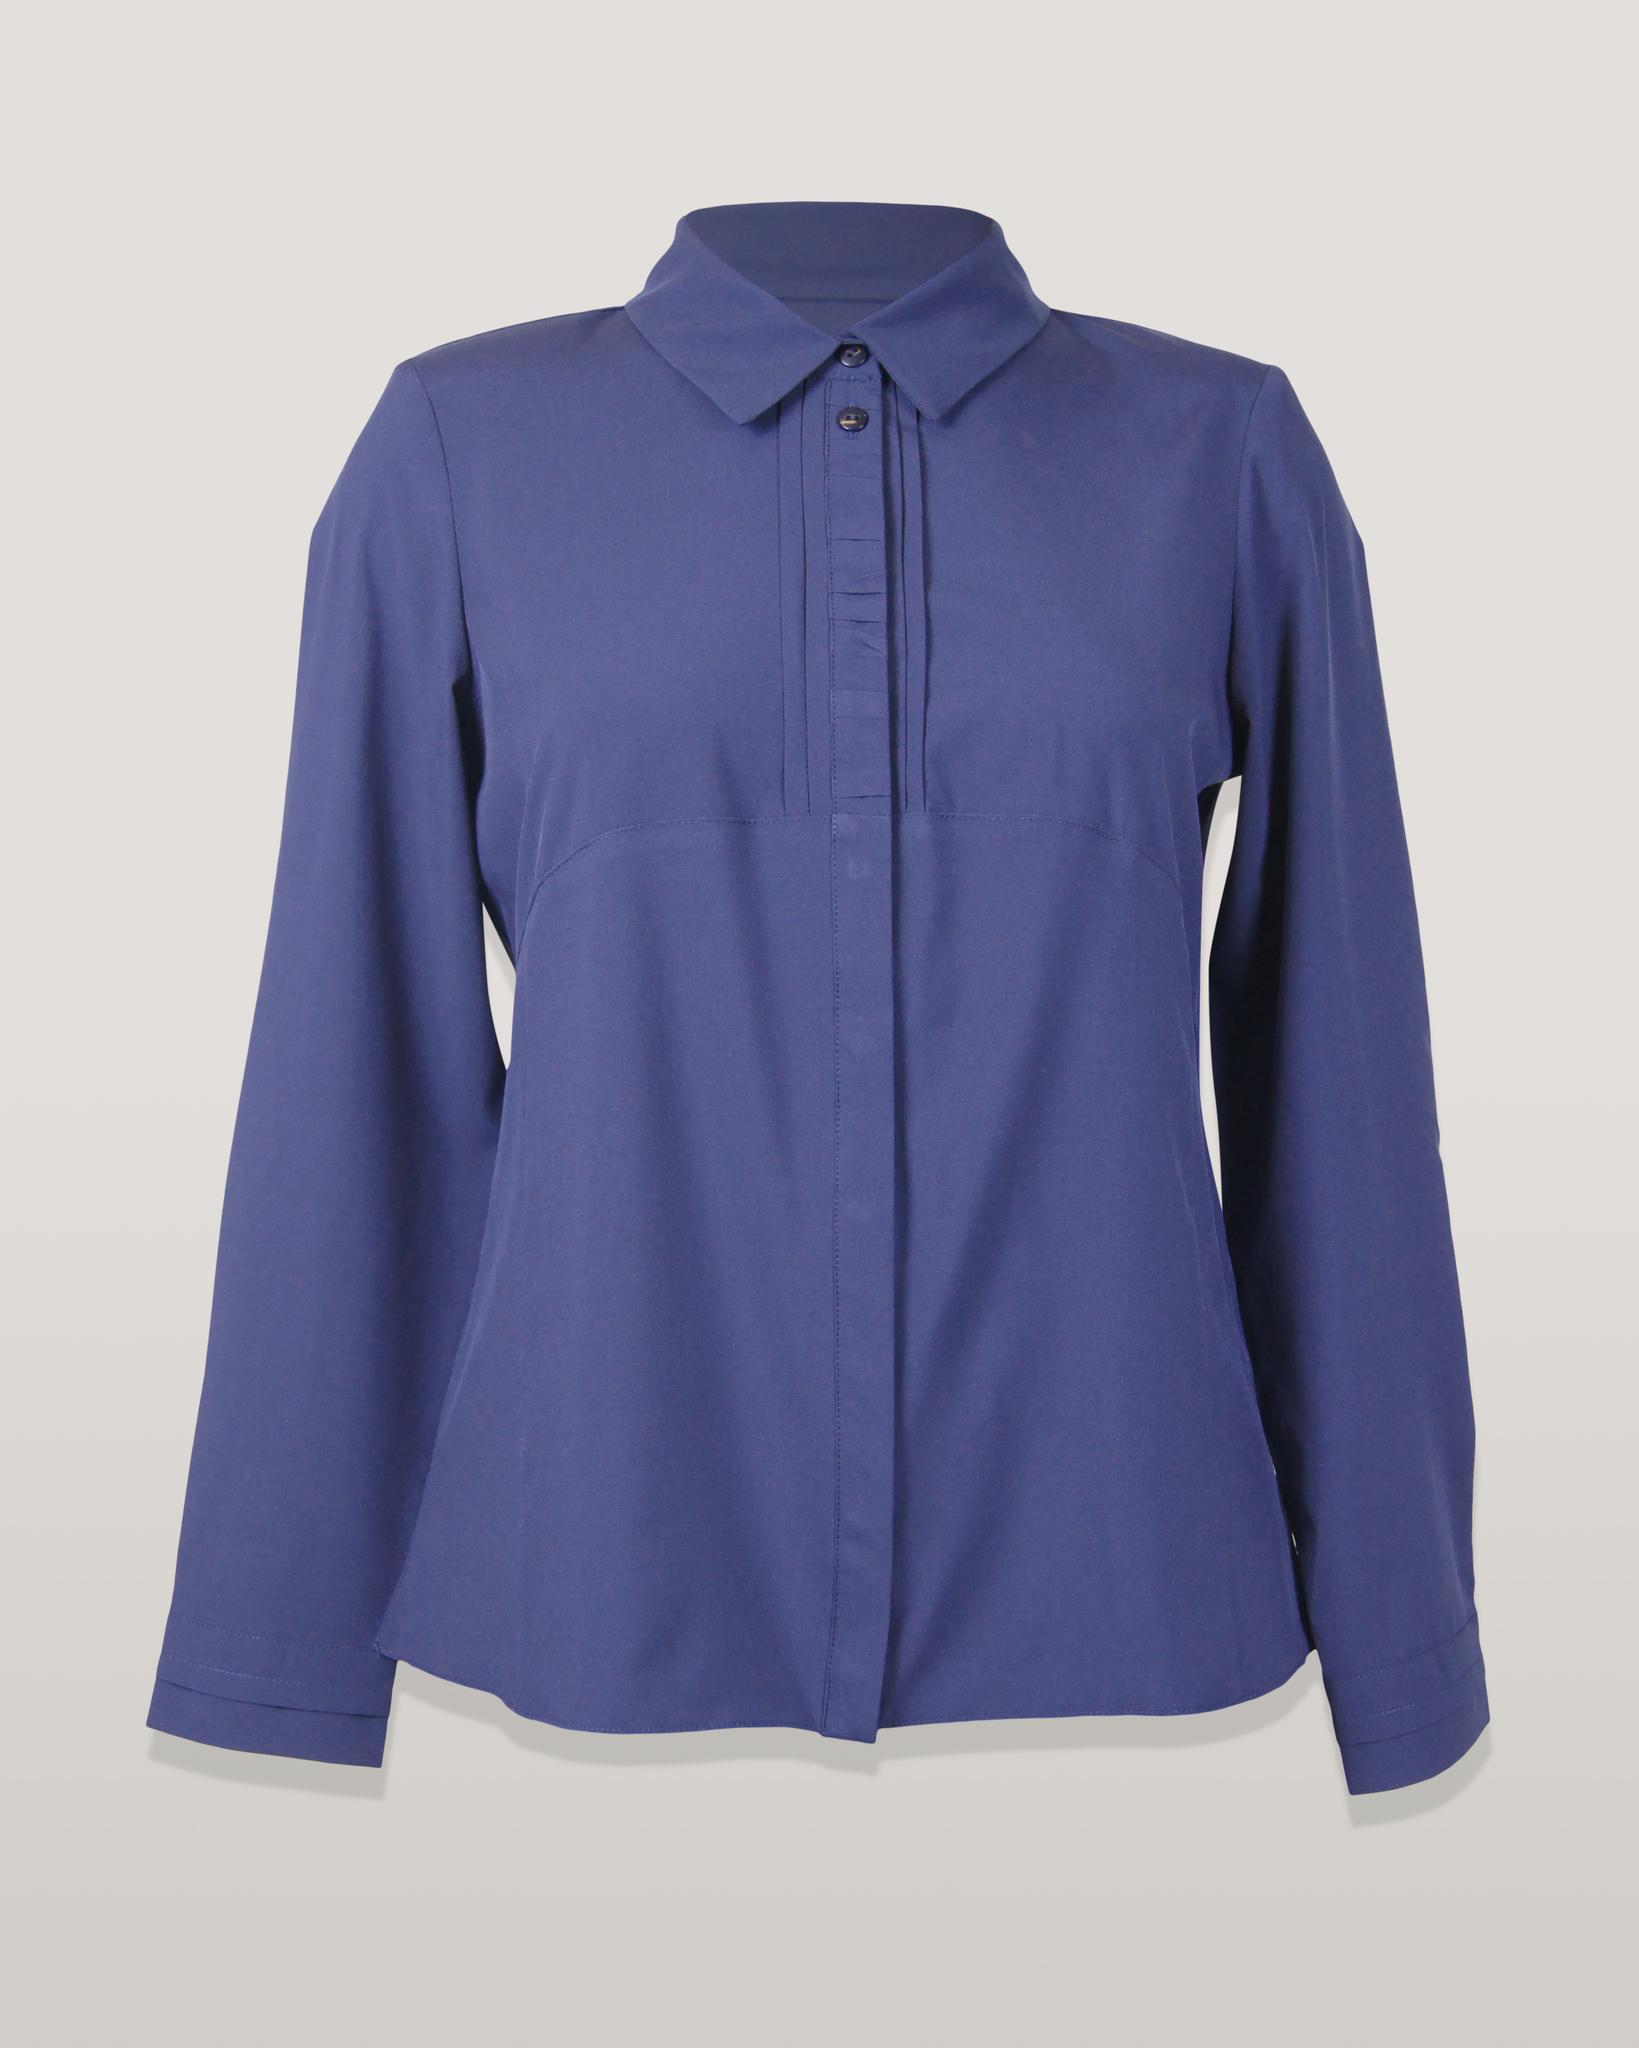 Блузка Laura Canorra 2182 рубашка поло складки однотон